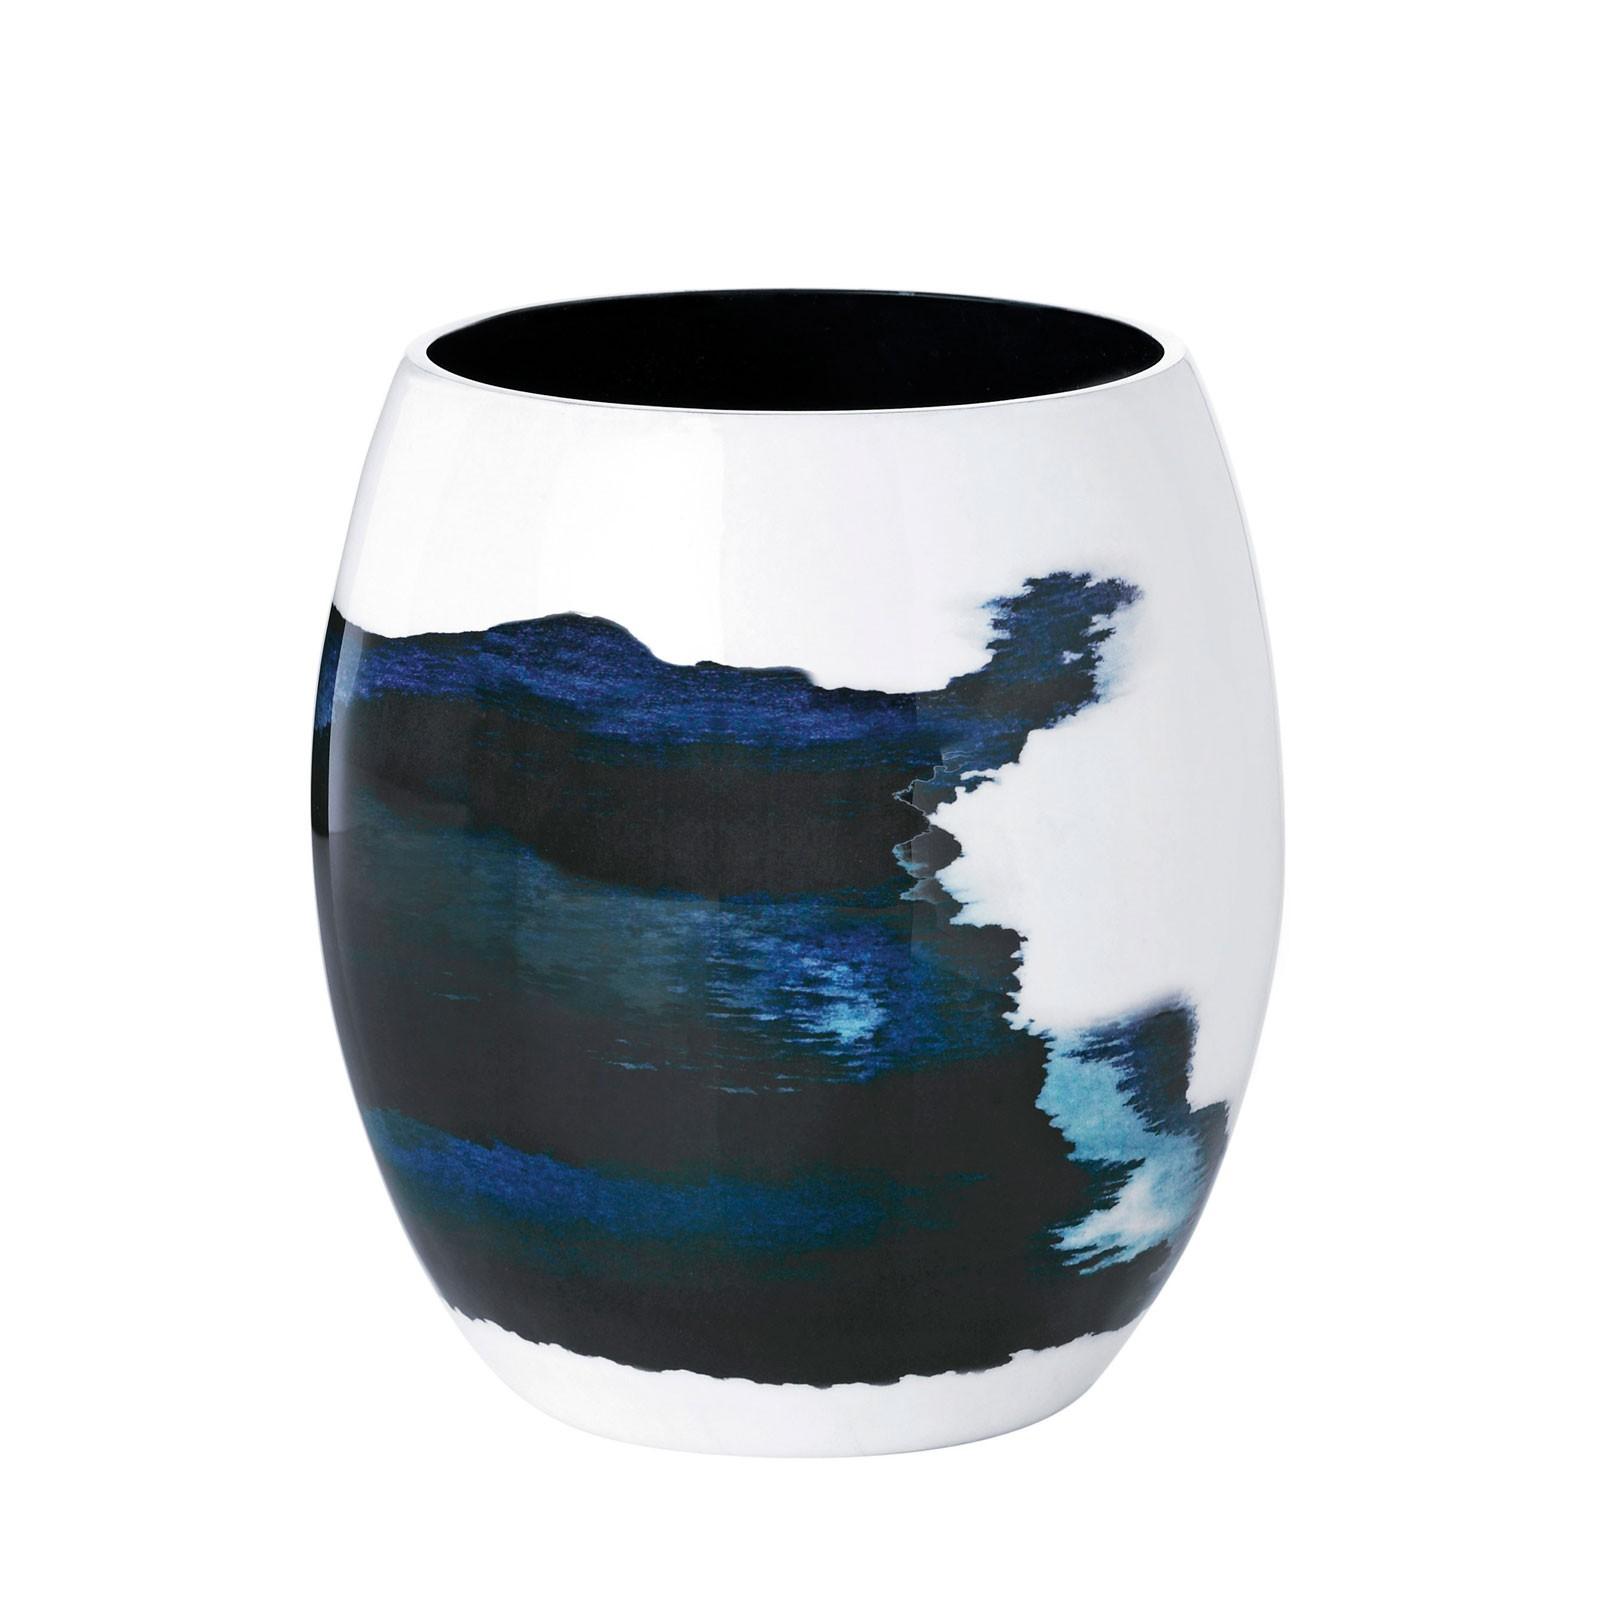 stelton Stockholm Vase klein Ø 13,1 cm AQUATIC